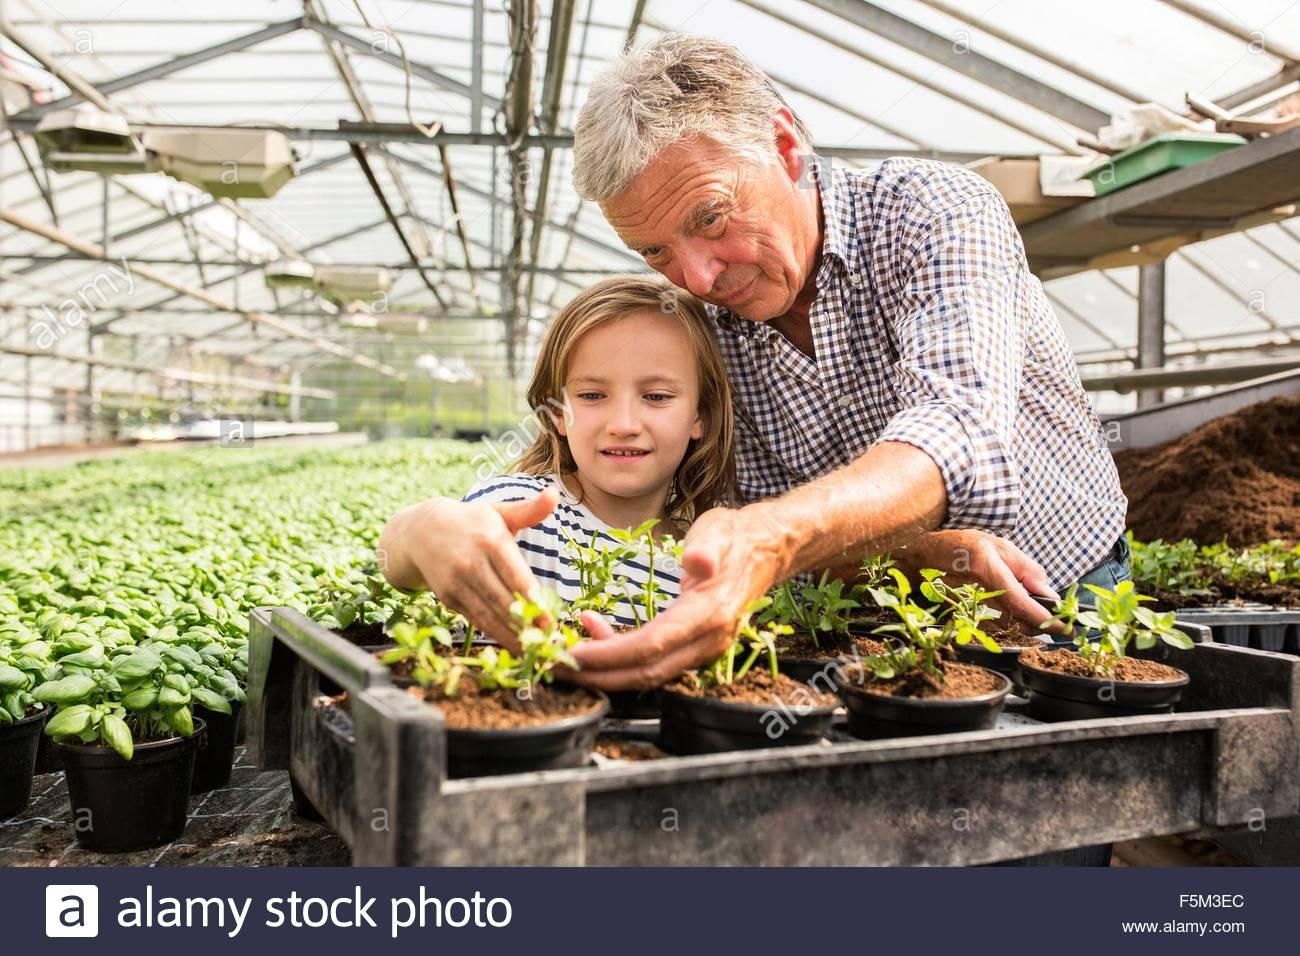 Großvater Arm um Enkelin betrachten Topfpflanzen Sämlinge im Treibhaus Stockbild